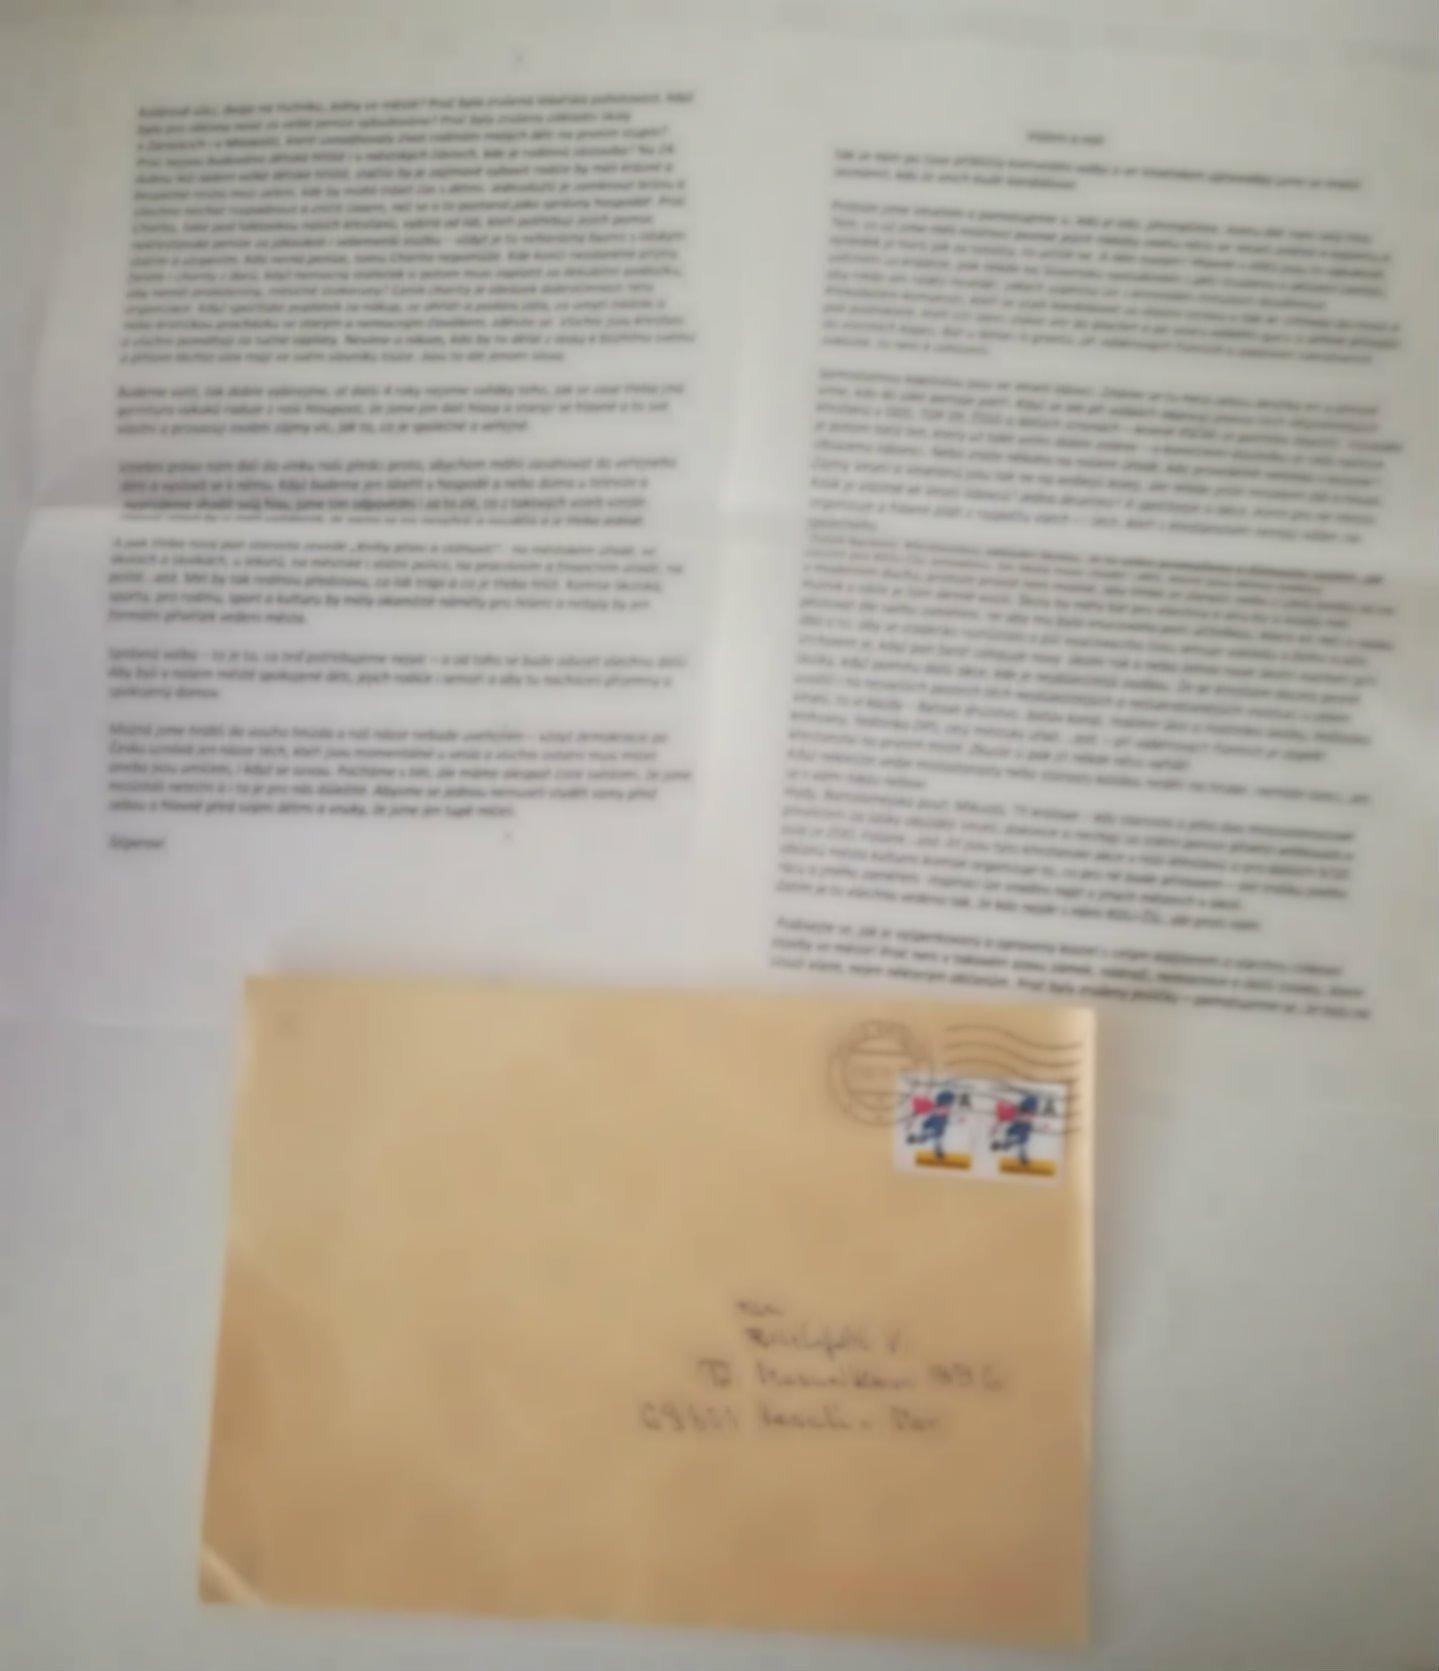 Staženo - Dopis Šišperovi - Brno